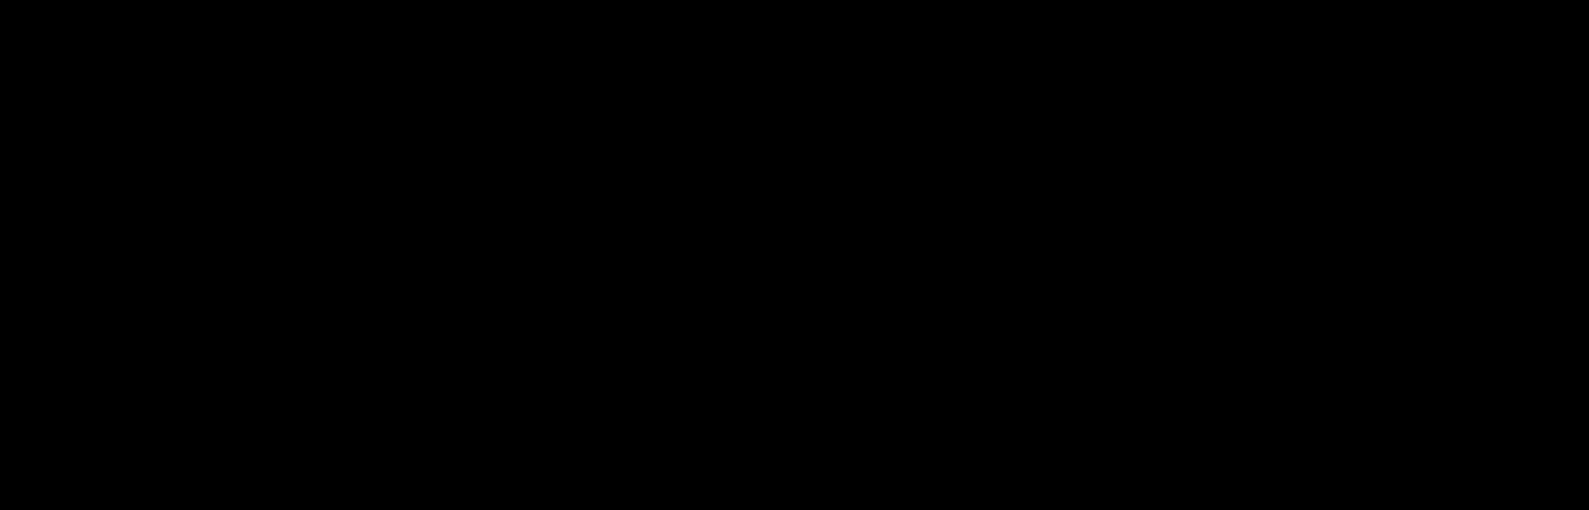 bandcamp logo black background - 1589×510